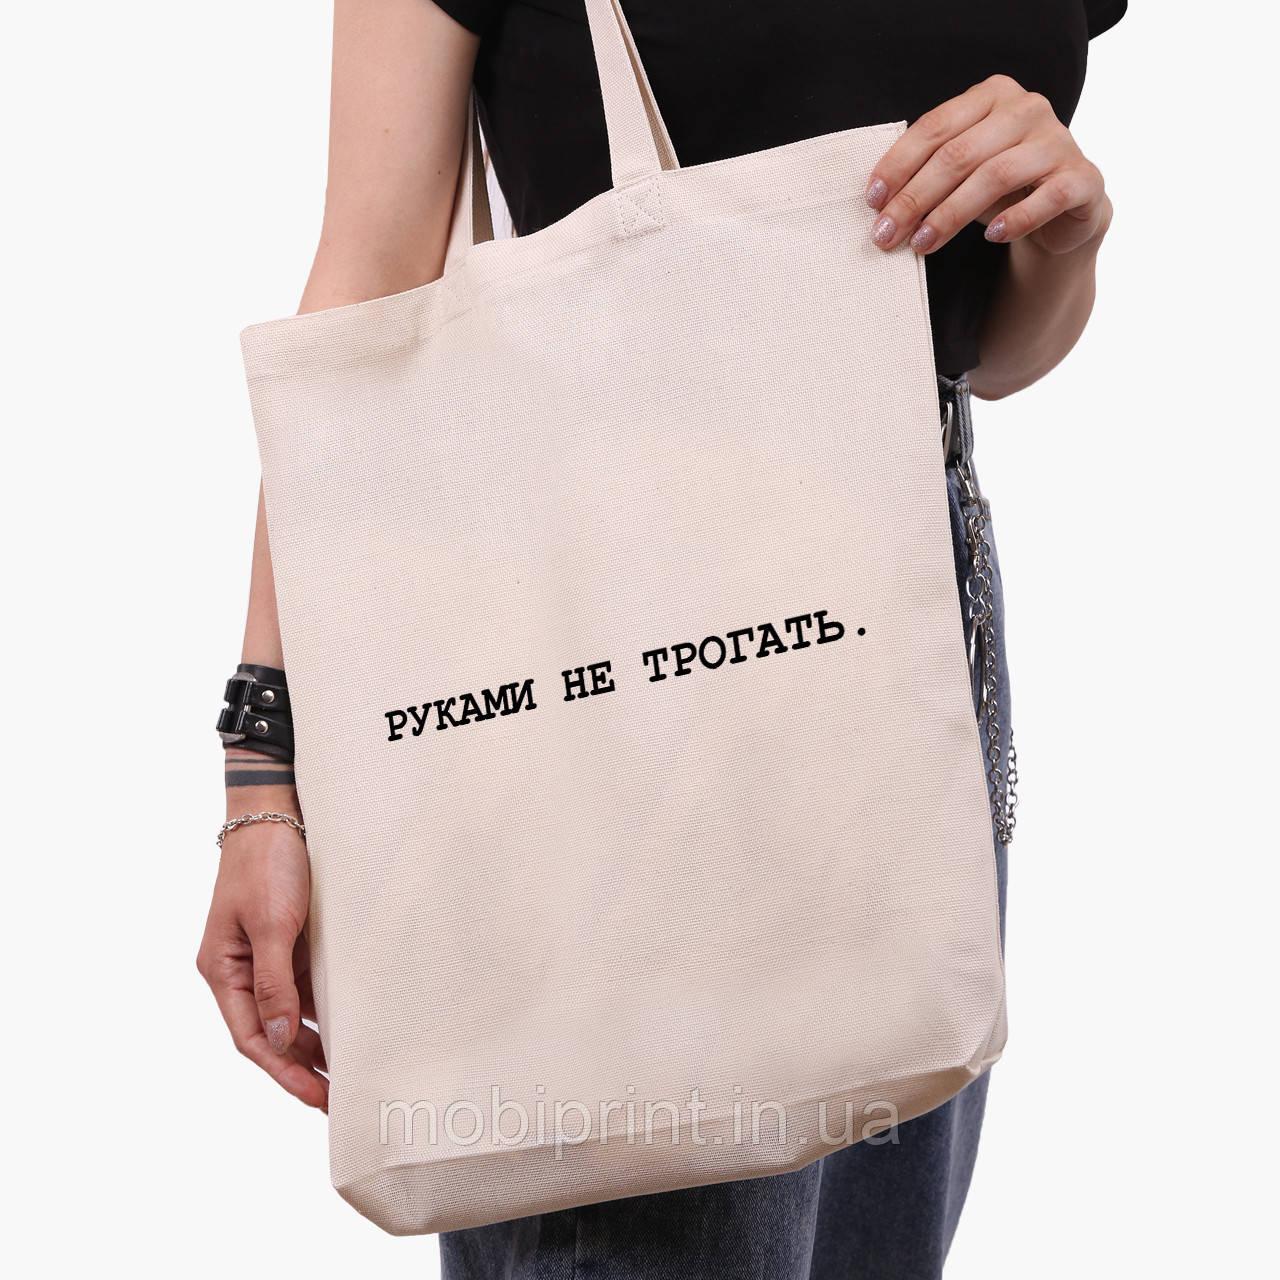 Еко сумка шоппер біла Руками не чіпати (Do not touch) (9227-1786-1) экосумка шопер 41*39*8 см